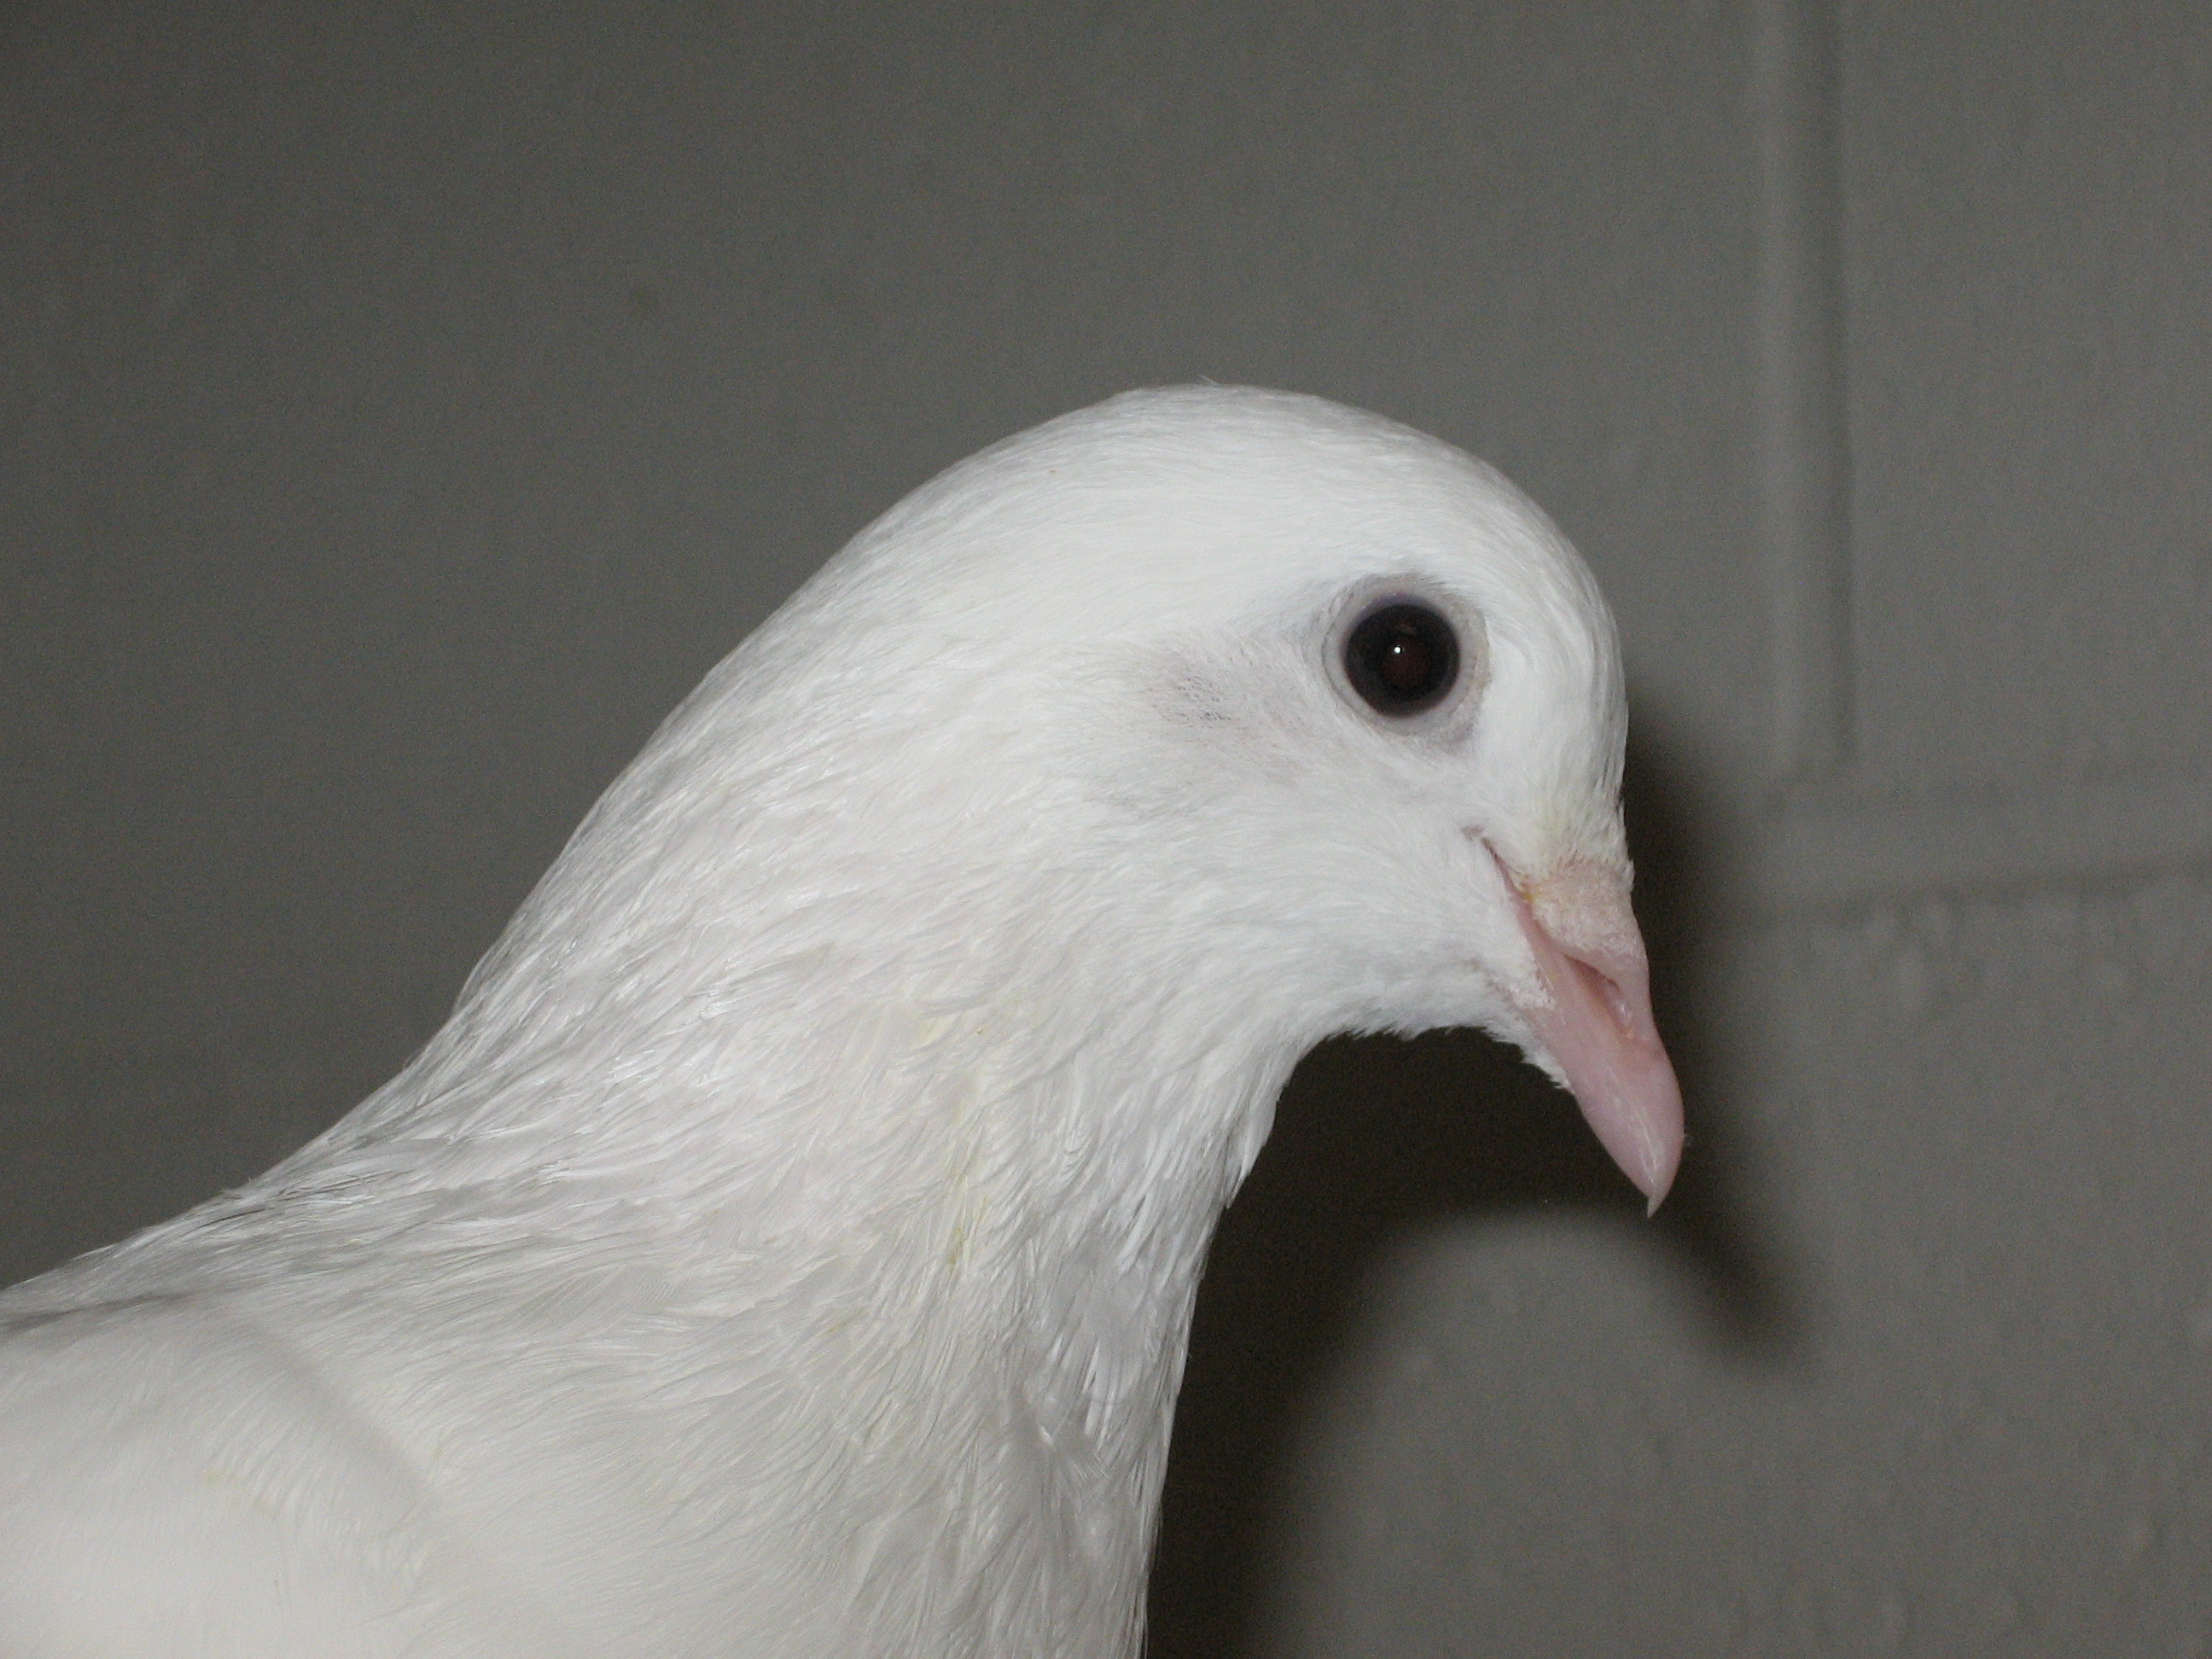 White Pigeon Names